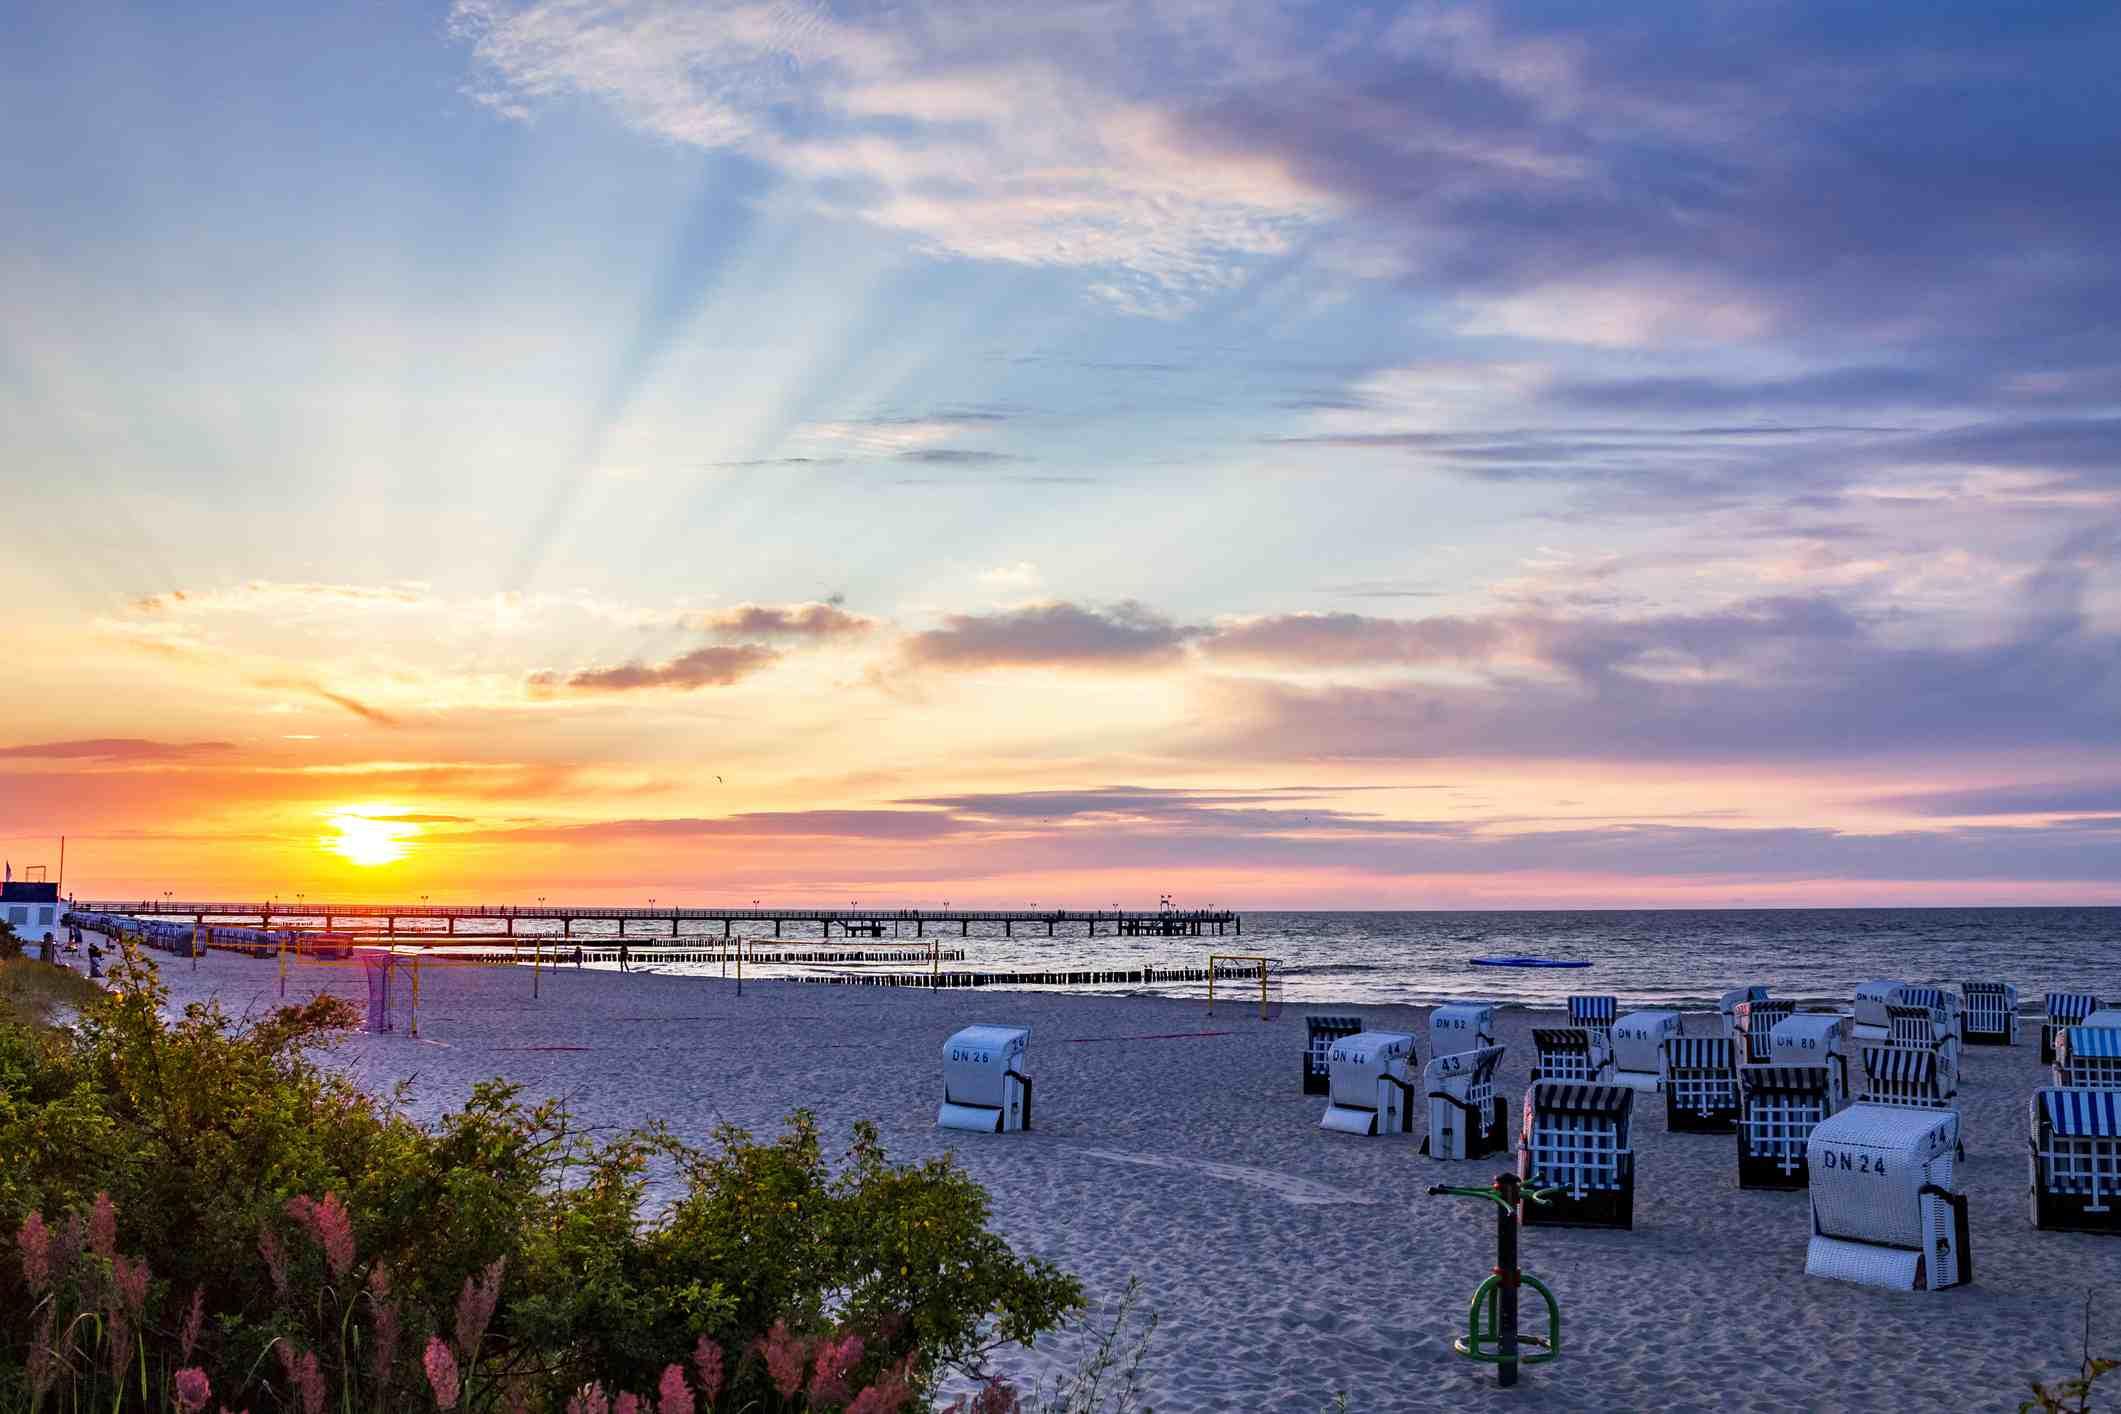 The Mecklenburg-Western Pomerania, a Baltic sea seaside resort Kuehlungsborn at sunset